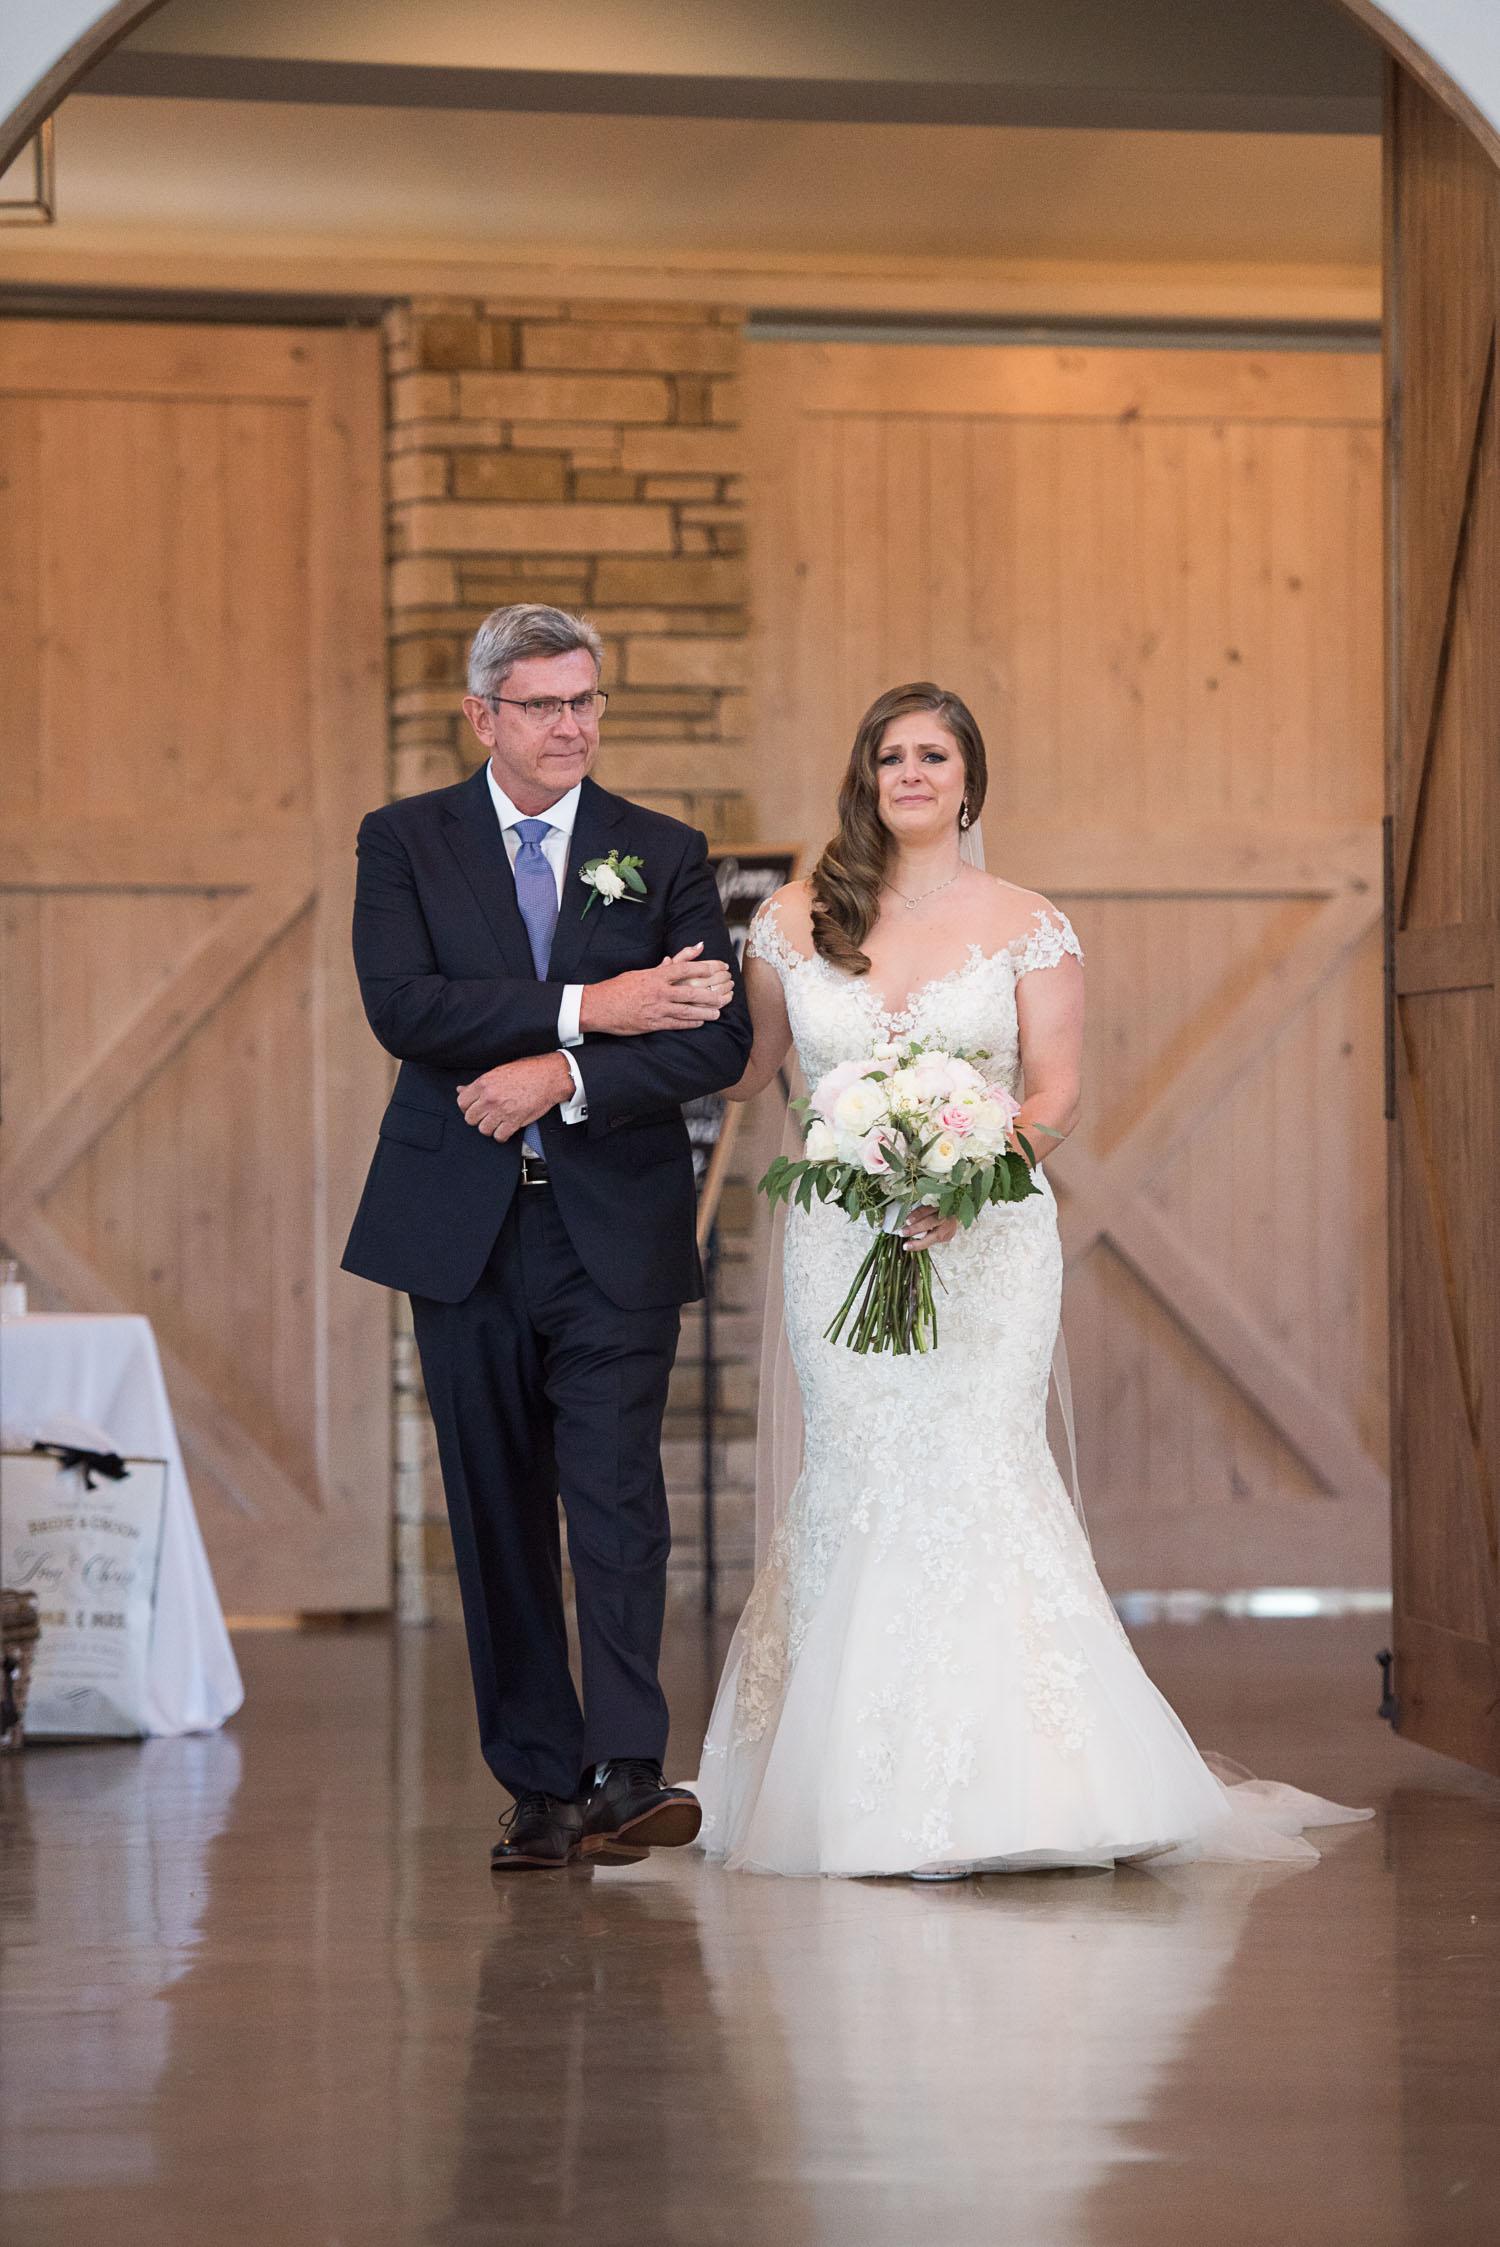 Hinton Wedding at Canyonwood Ridge Dripping Springs Texas Wedding Photography-87.jpg